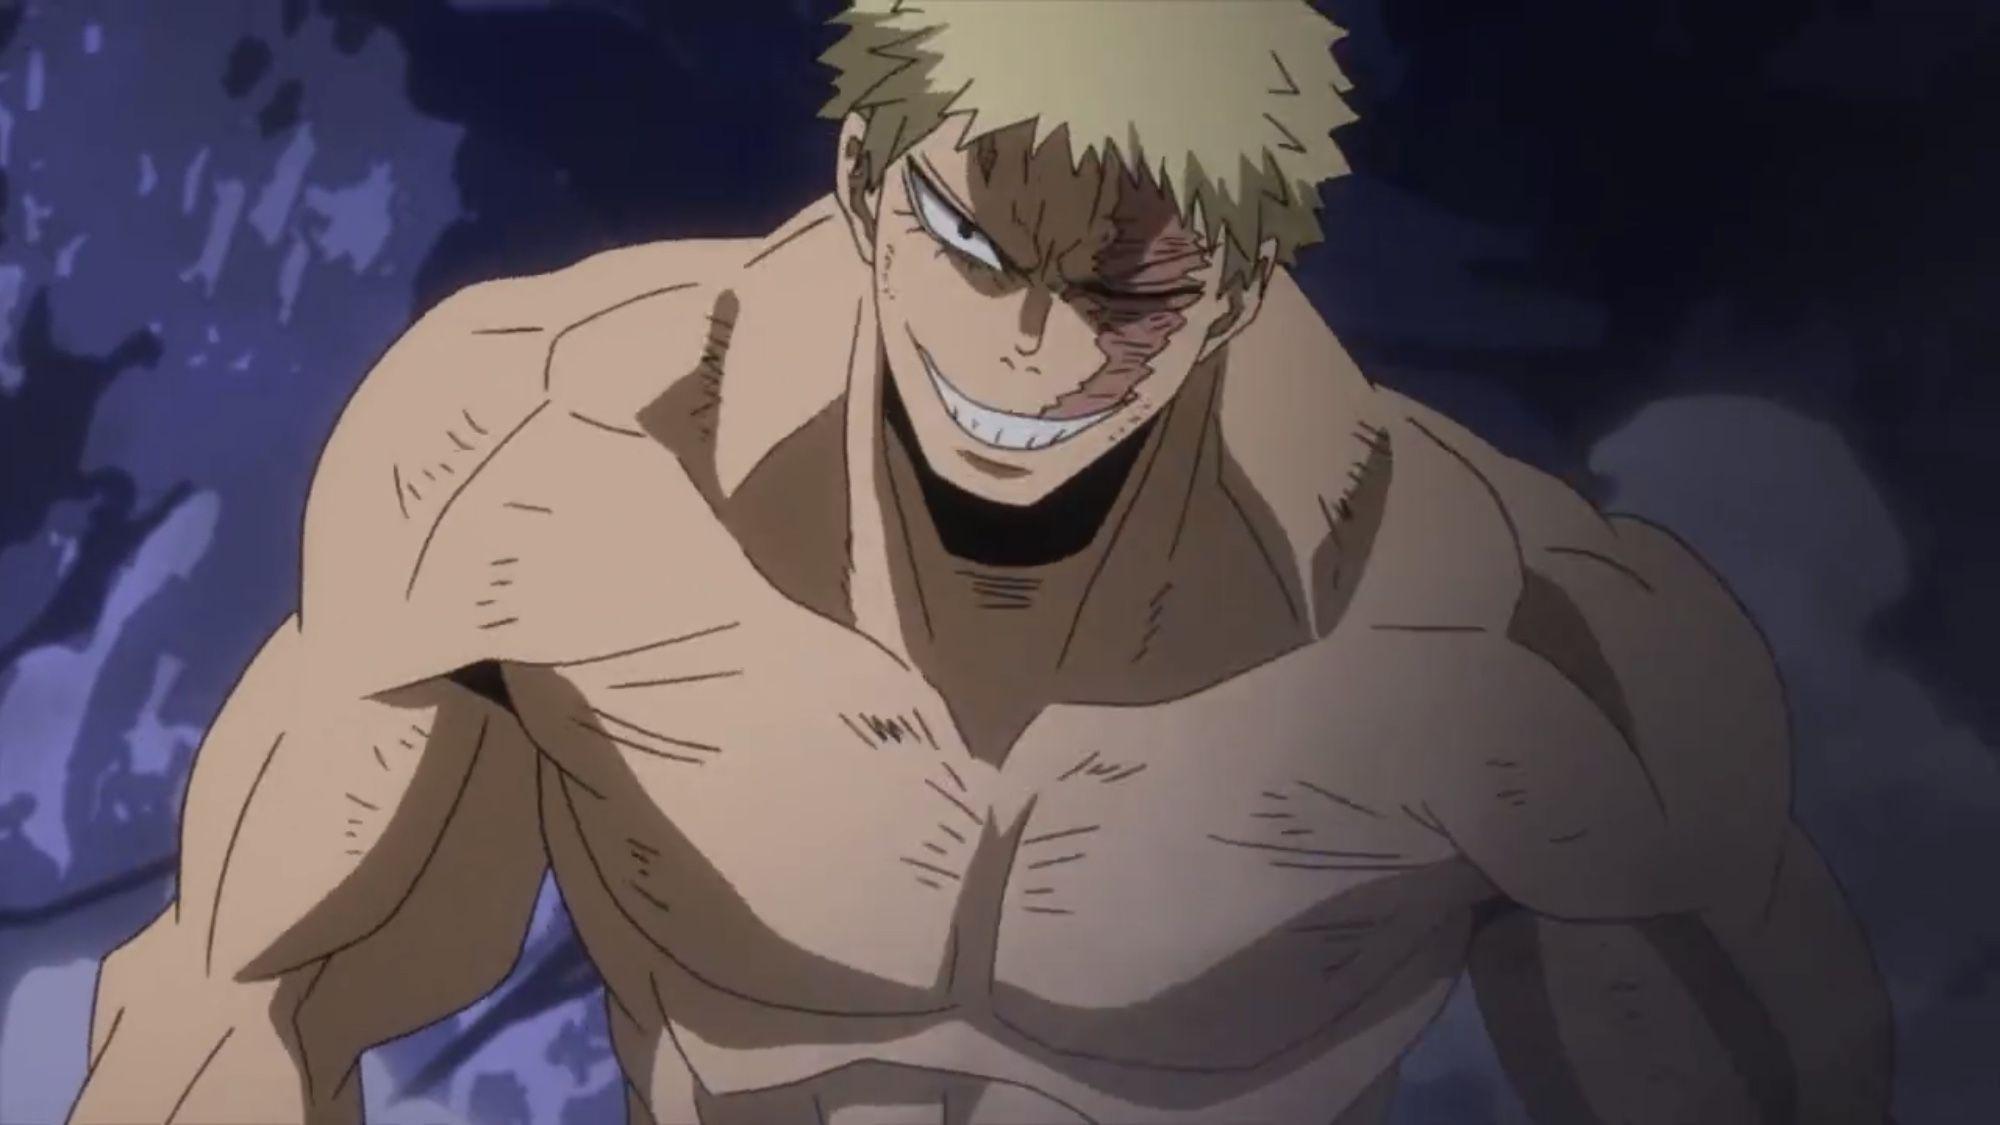 Muscular Boku No Hero Academia Anime Cartoon Drawings Anime Characters